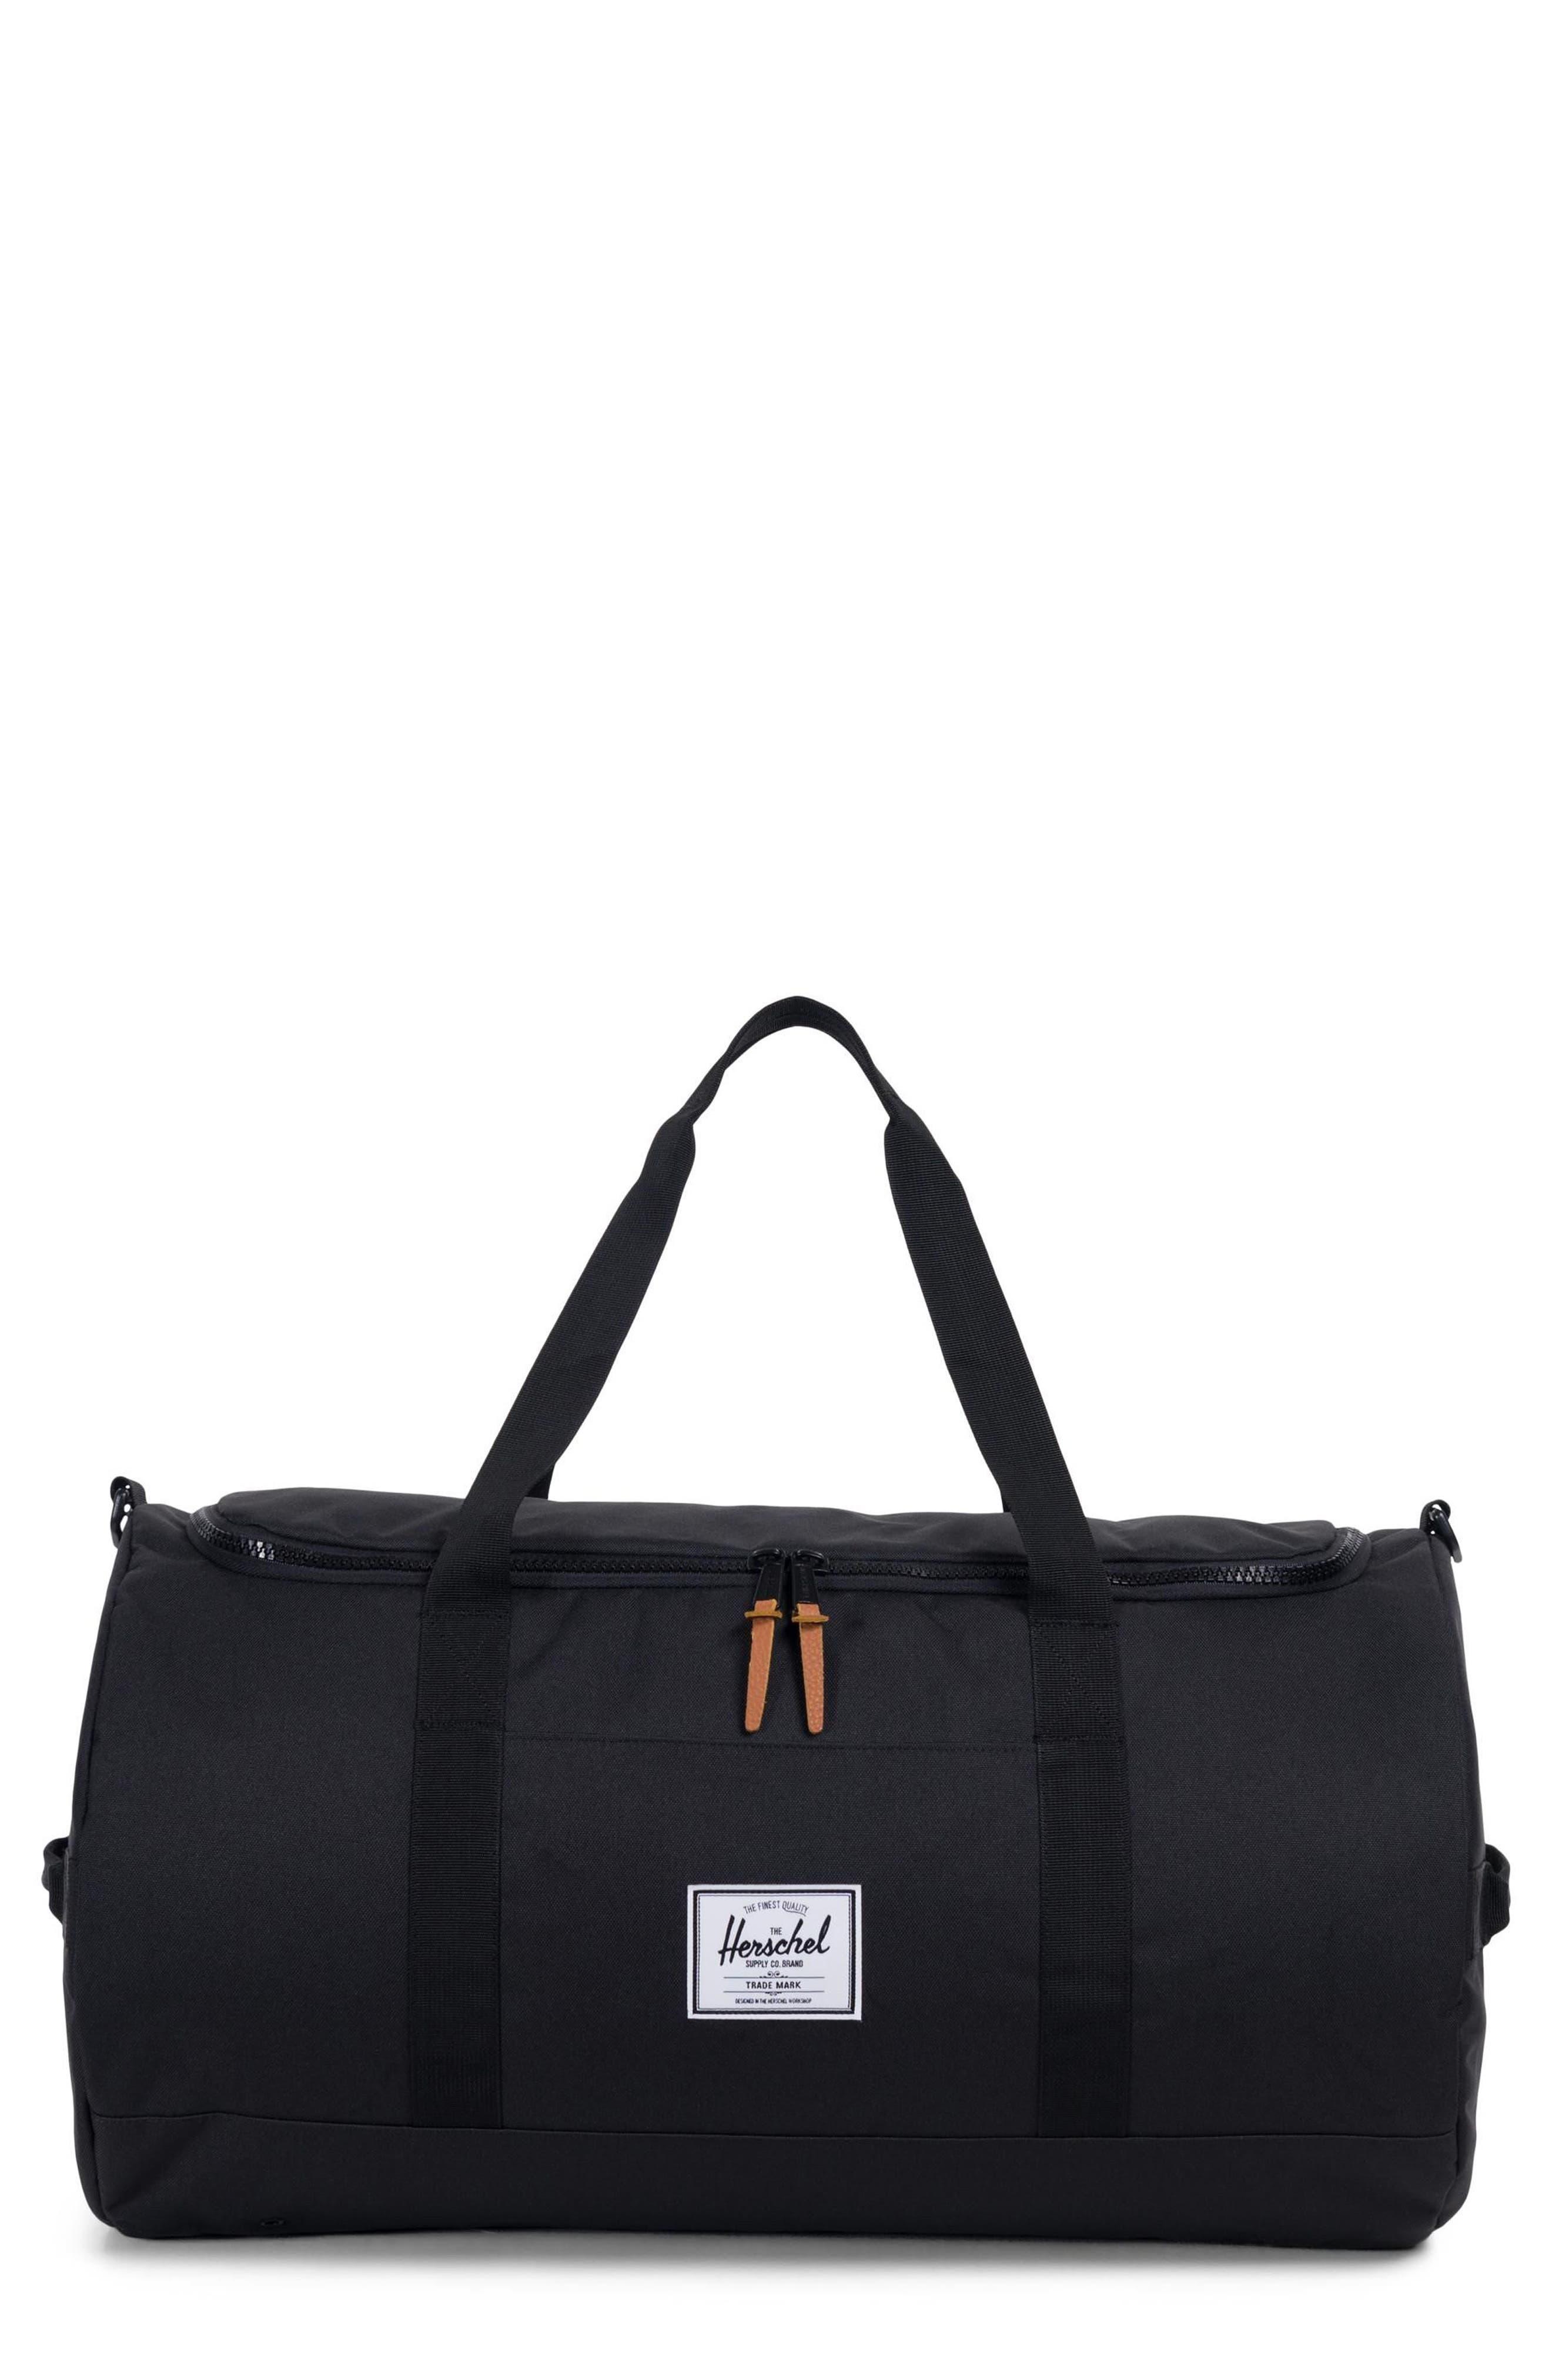 Sutton Duffel Bag,                             Main thumbnail 1, color,                             Black